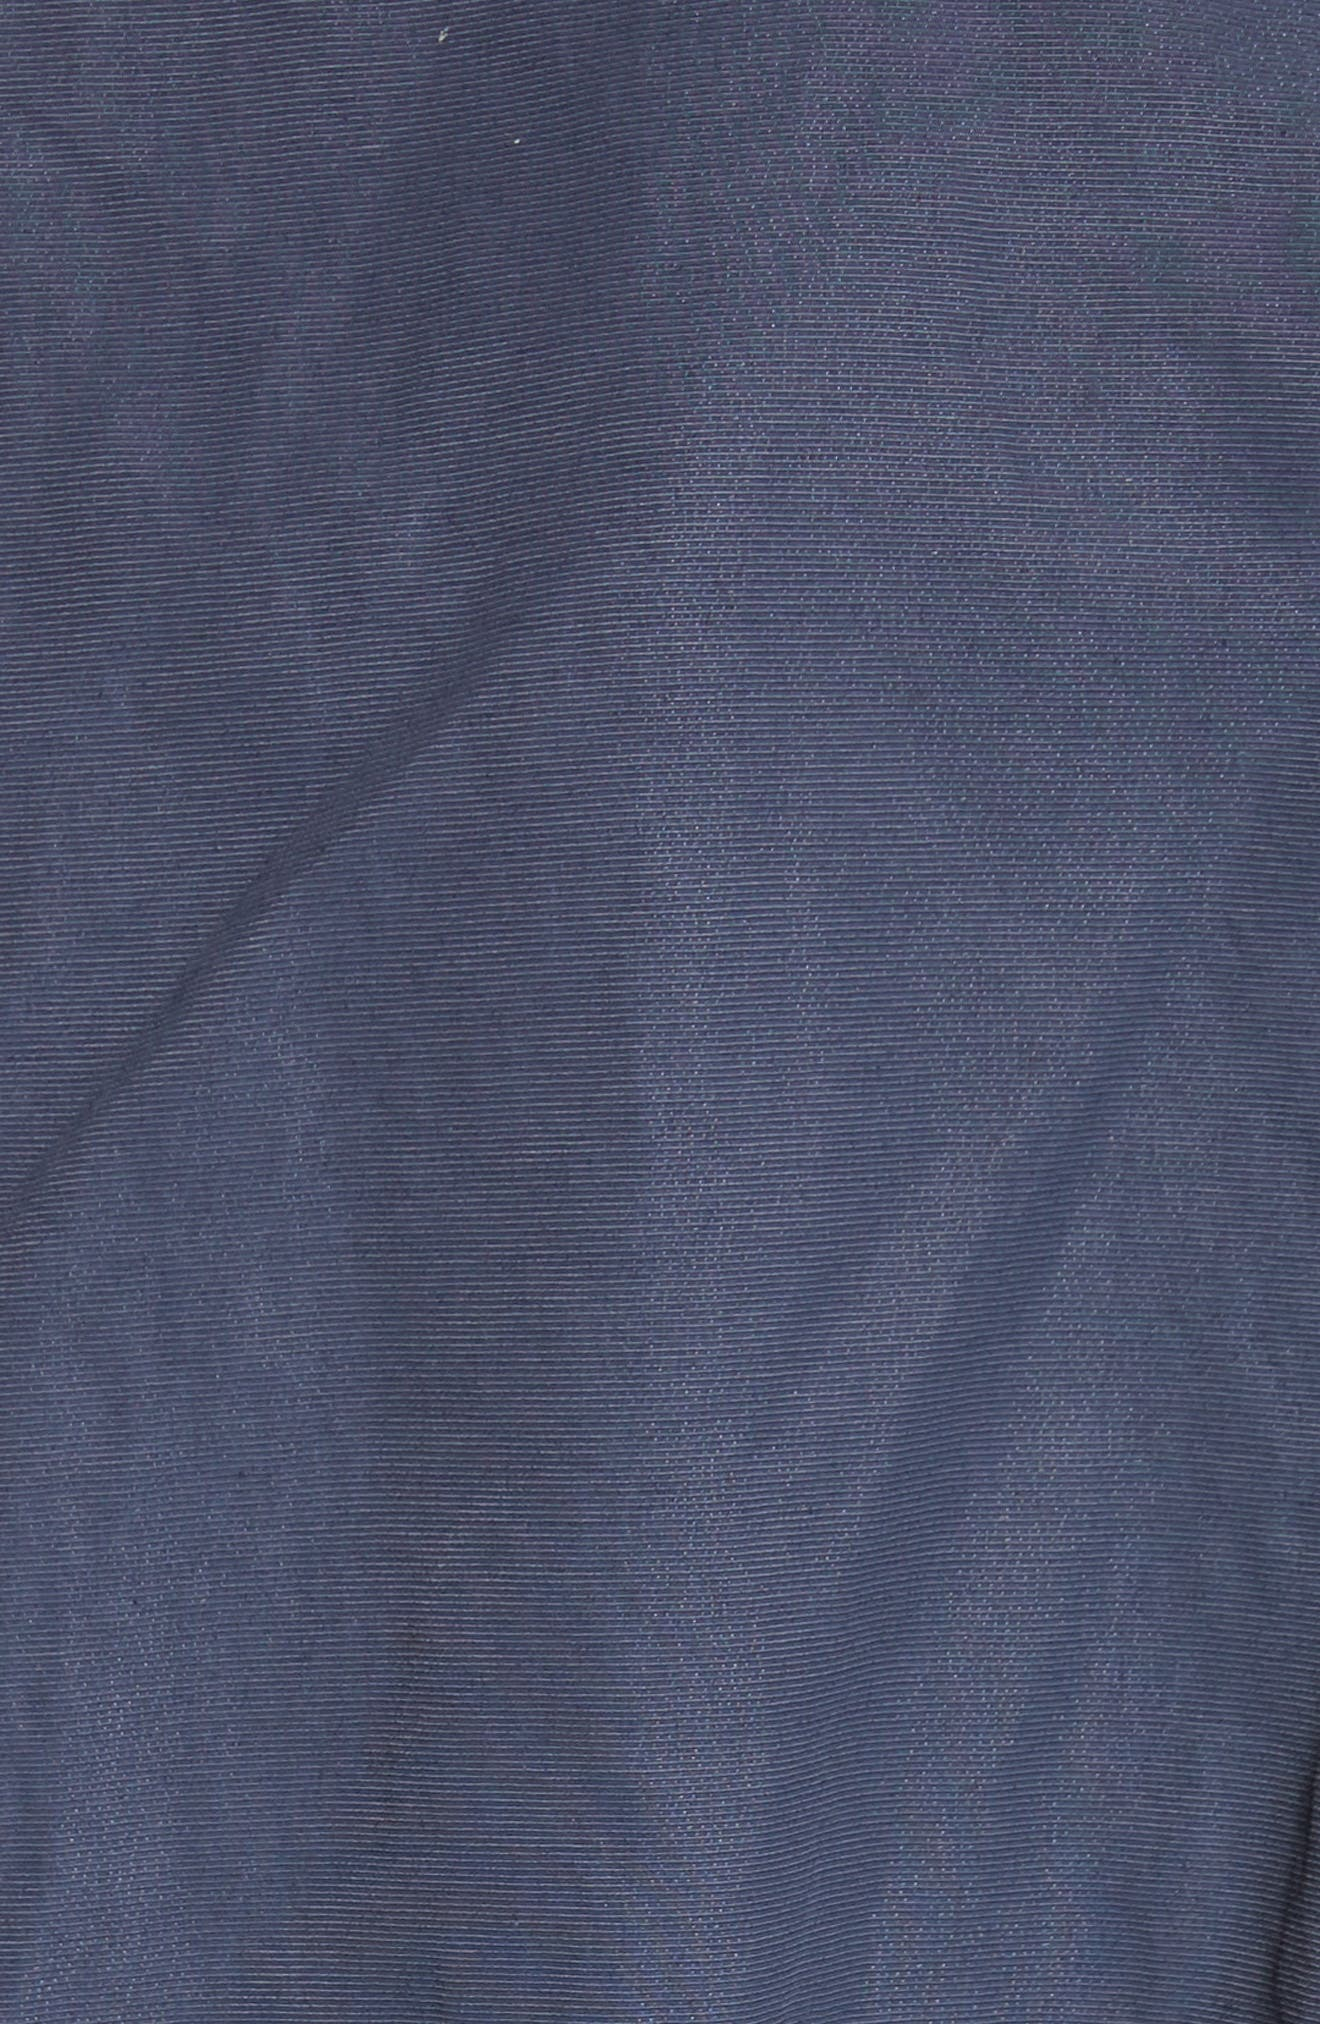 Suede & Cotton Blend Kimono Jacket,                             Alternate thumbnail 6, color,                             Navy